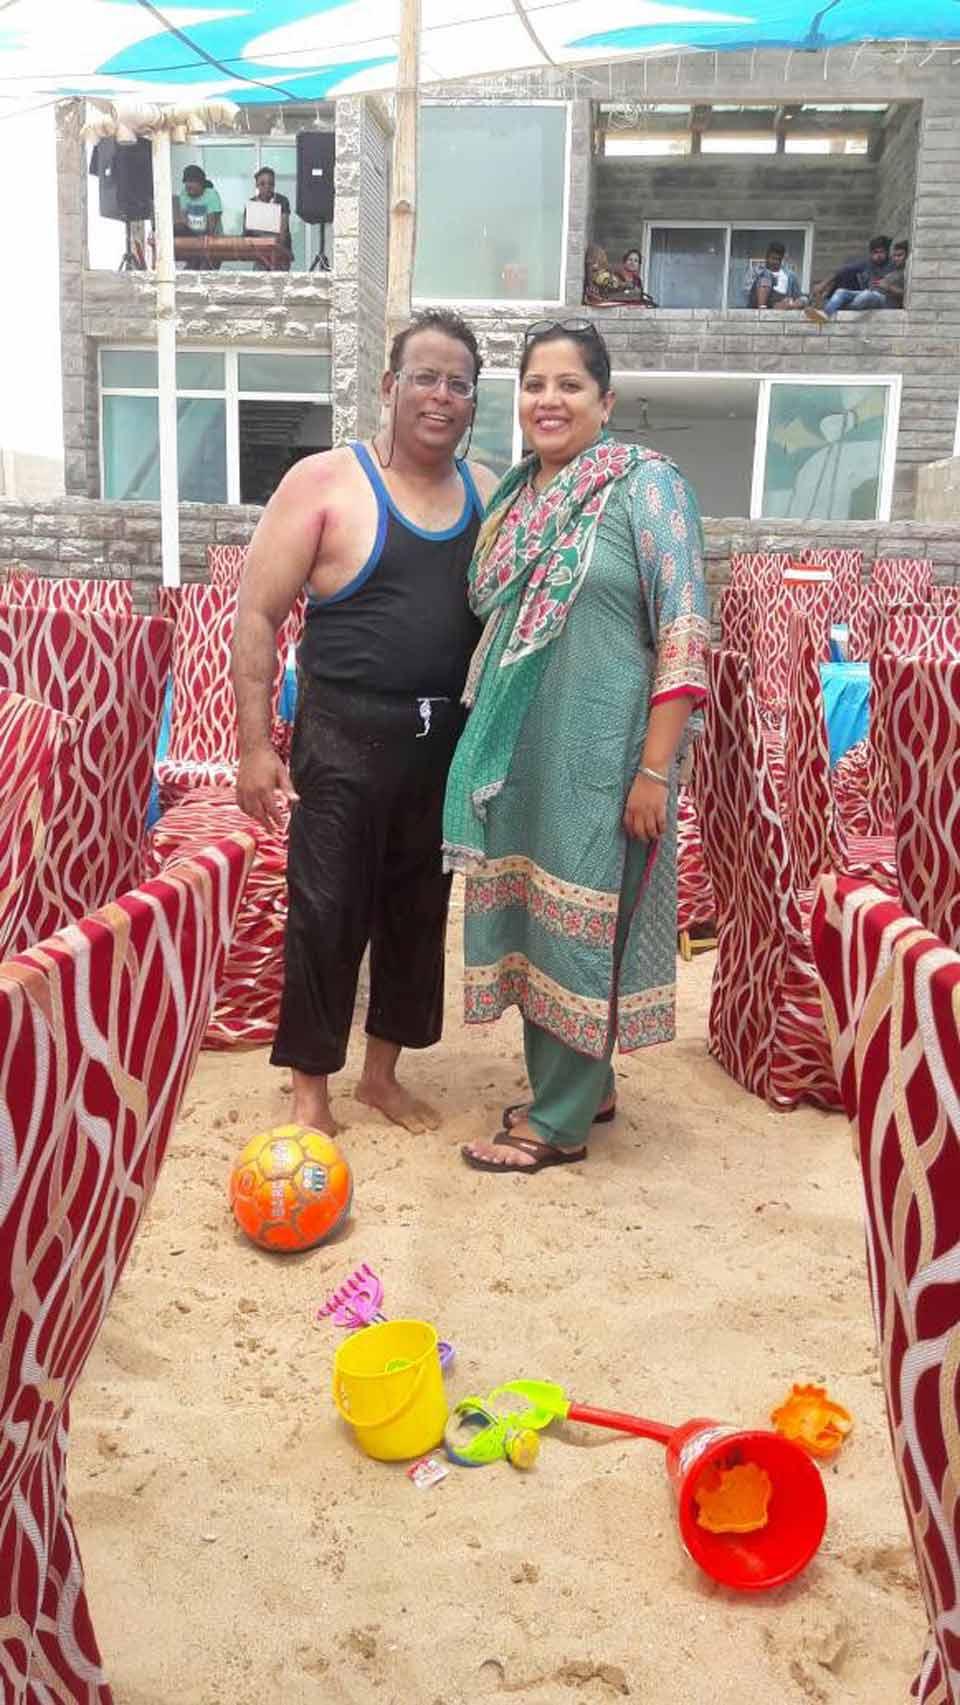 Dr. Ata Ur Rehman and Dr. Kiran Ata Ur Rehman